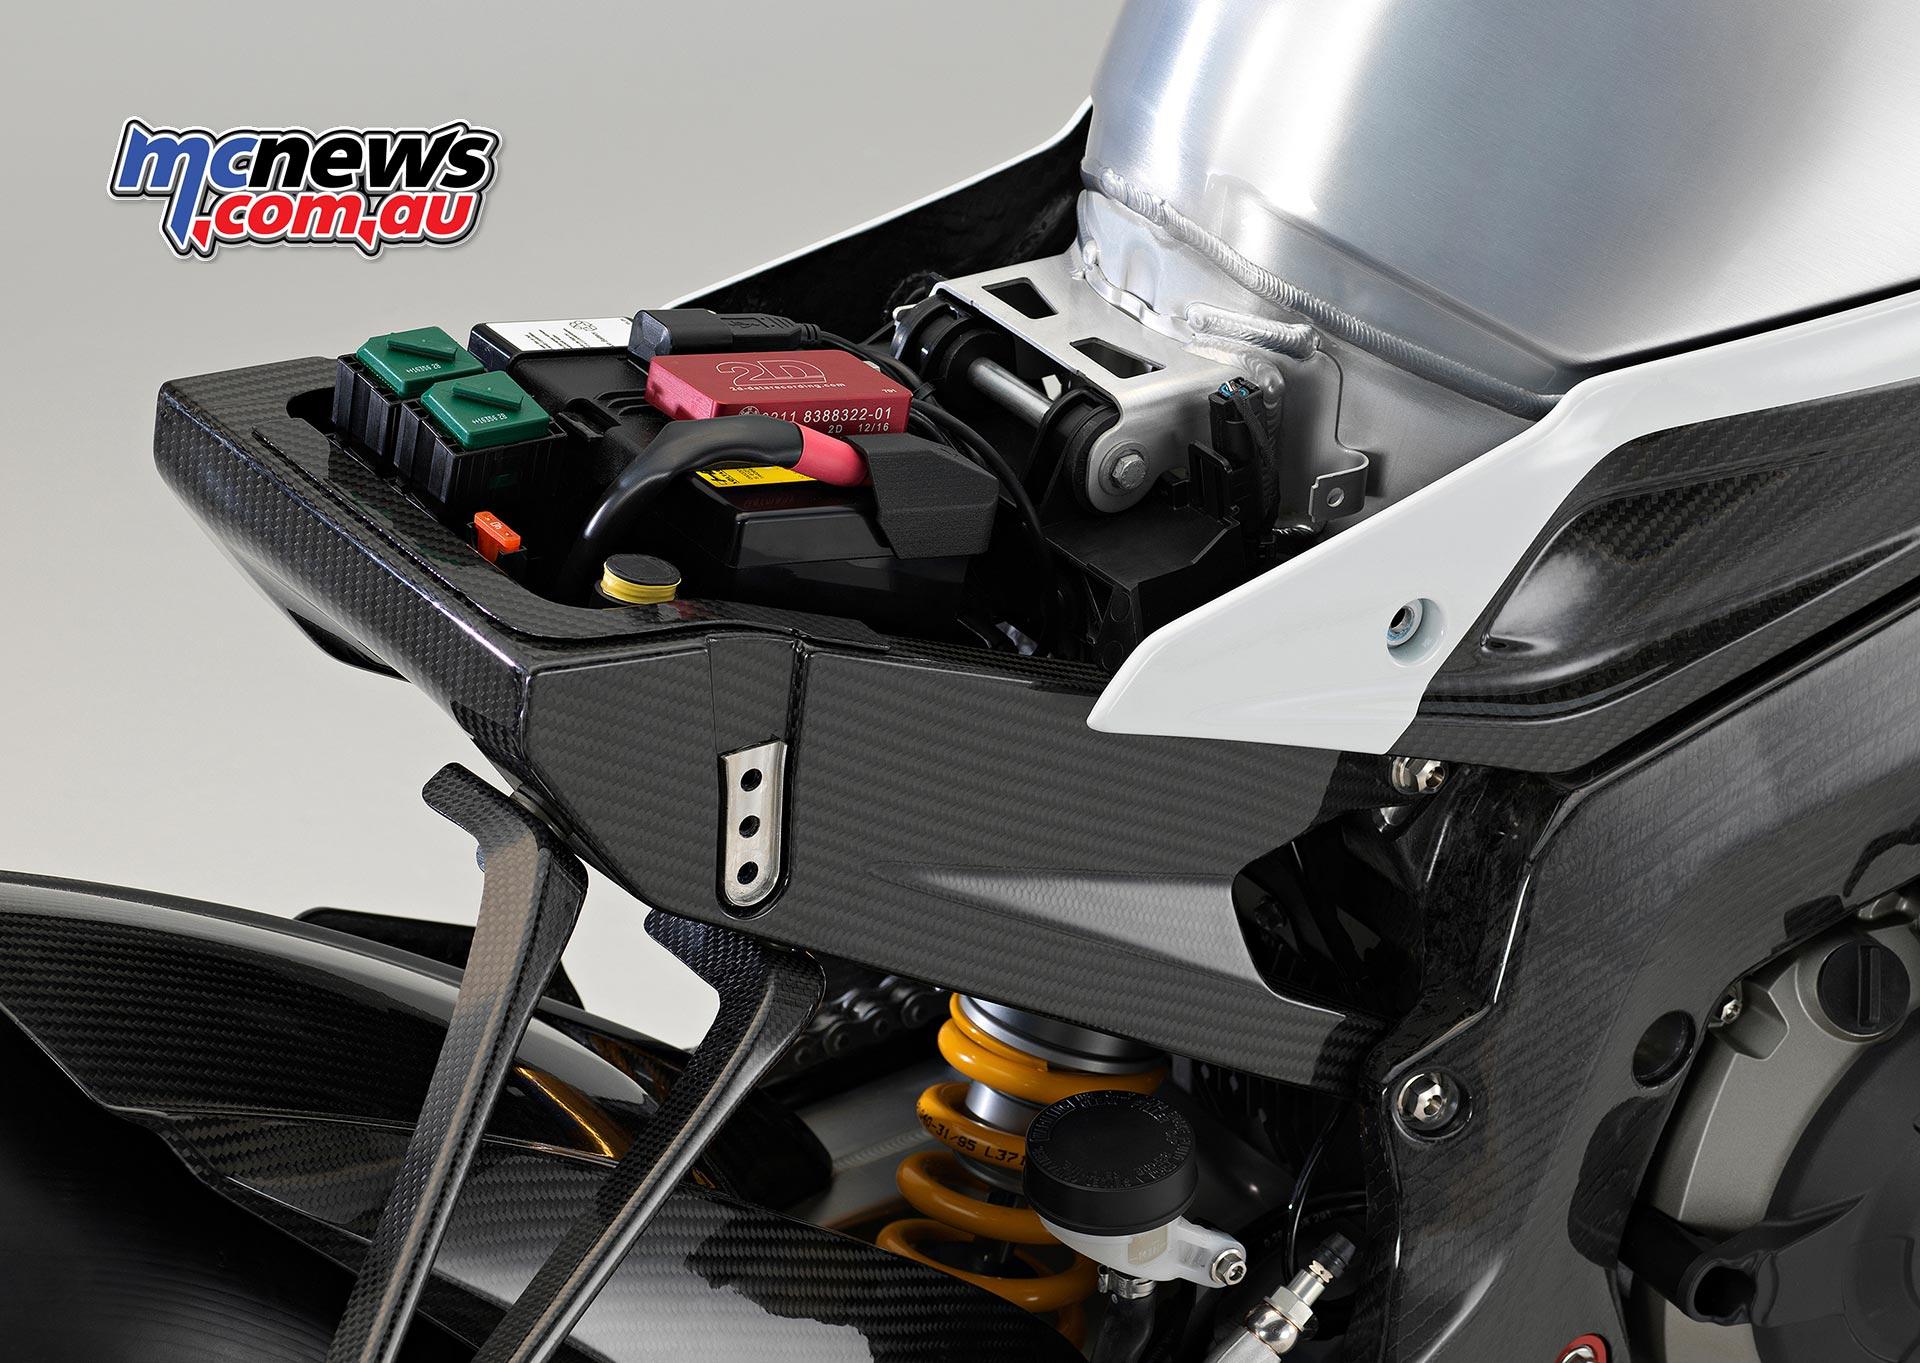 Bmw S 1000 Rr Next Level Introducing Hp4 Race Mcnews Com Au